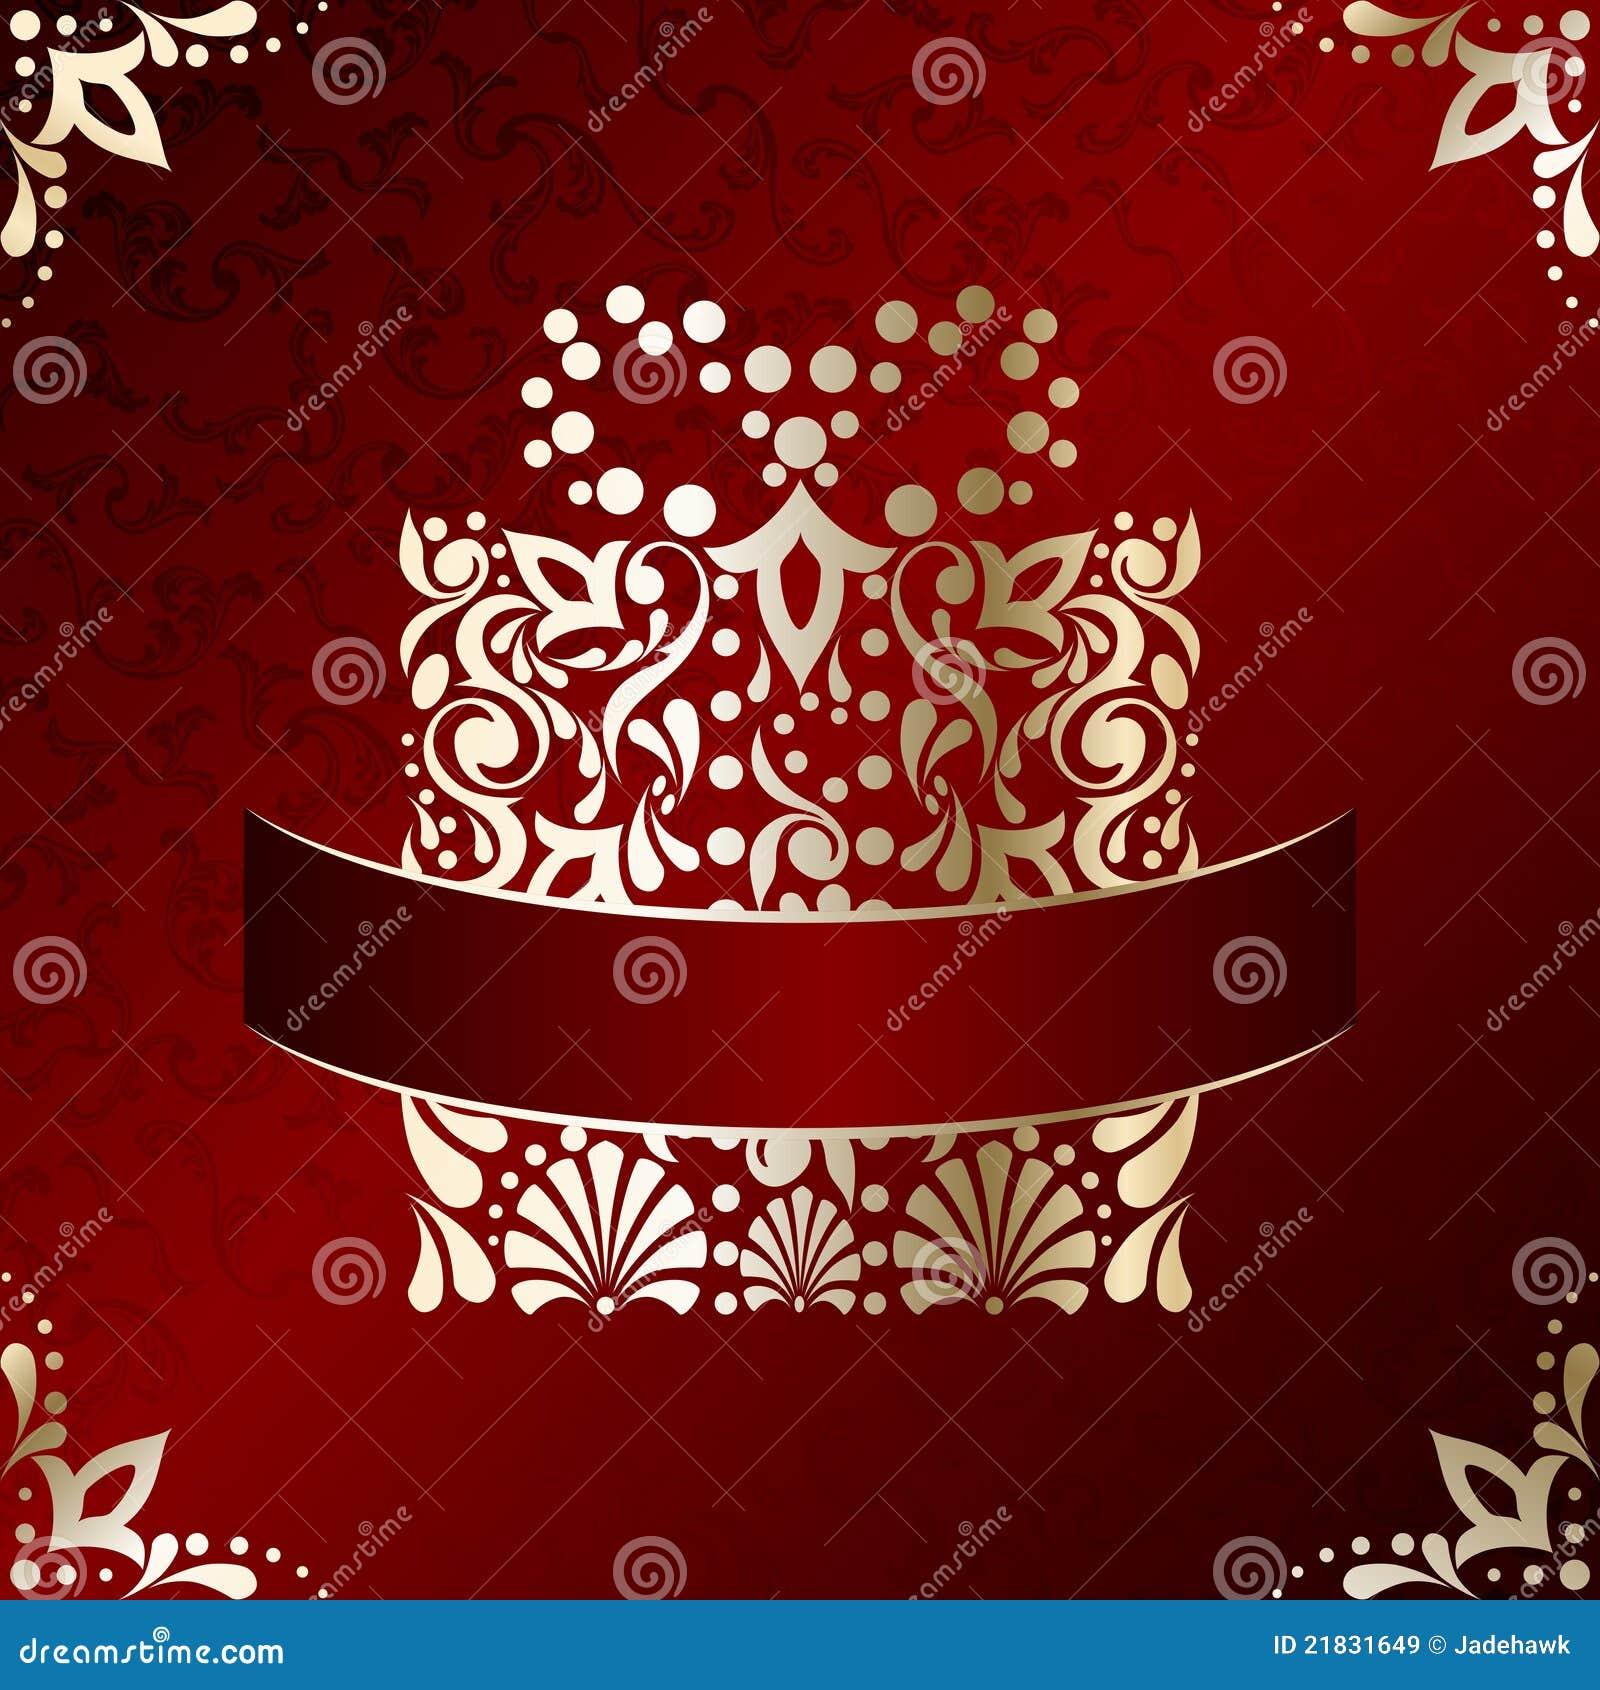 Elegant christmas card with filigree present stock vector for Elegant christmas card ideas